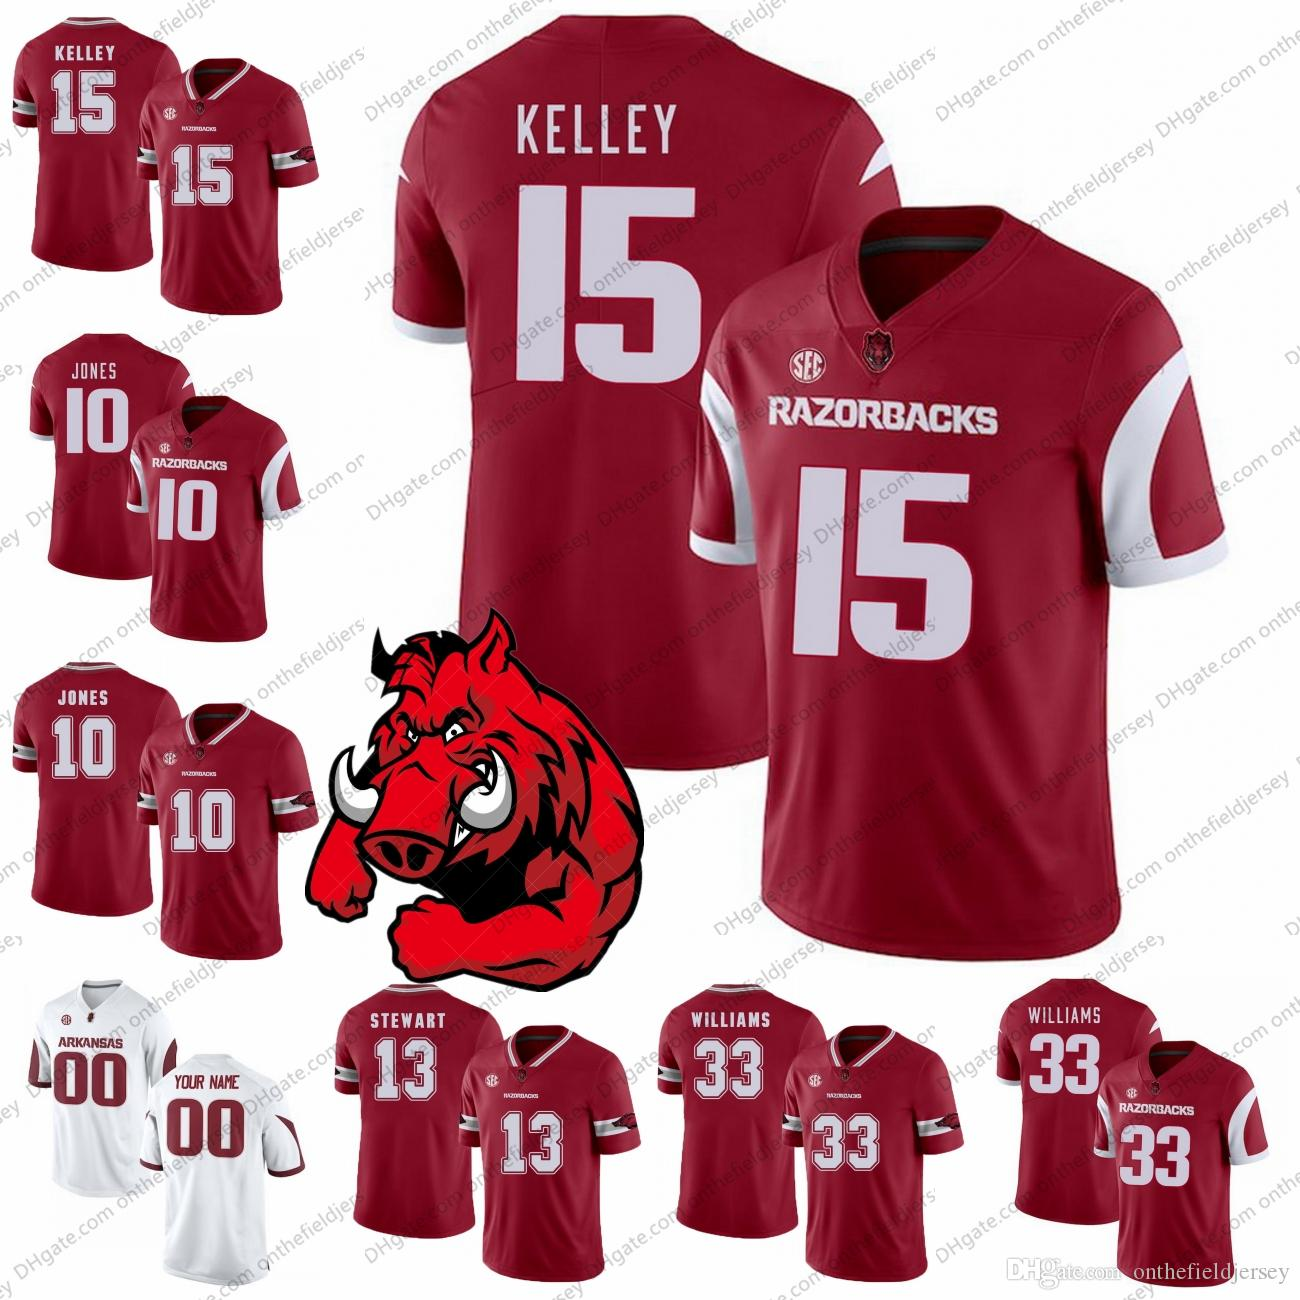 Arkansas Razorbacks 2018 NEW STYLE NCAA College Football Jerseys  10 ... c9e371d6f